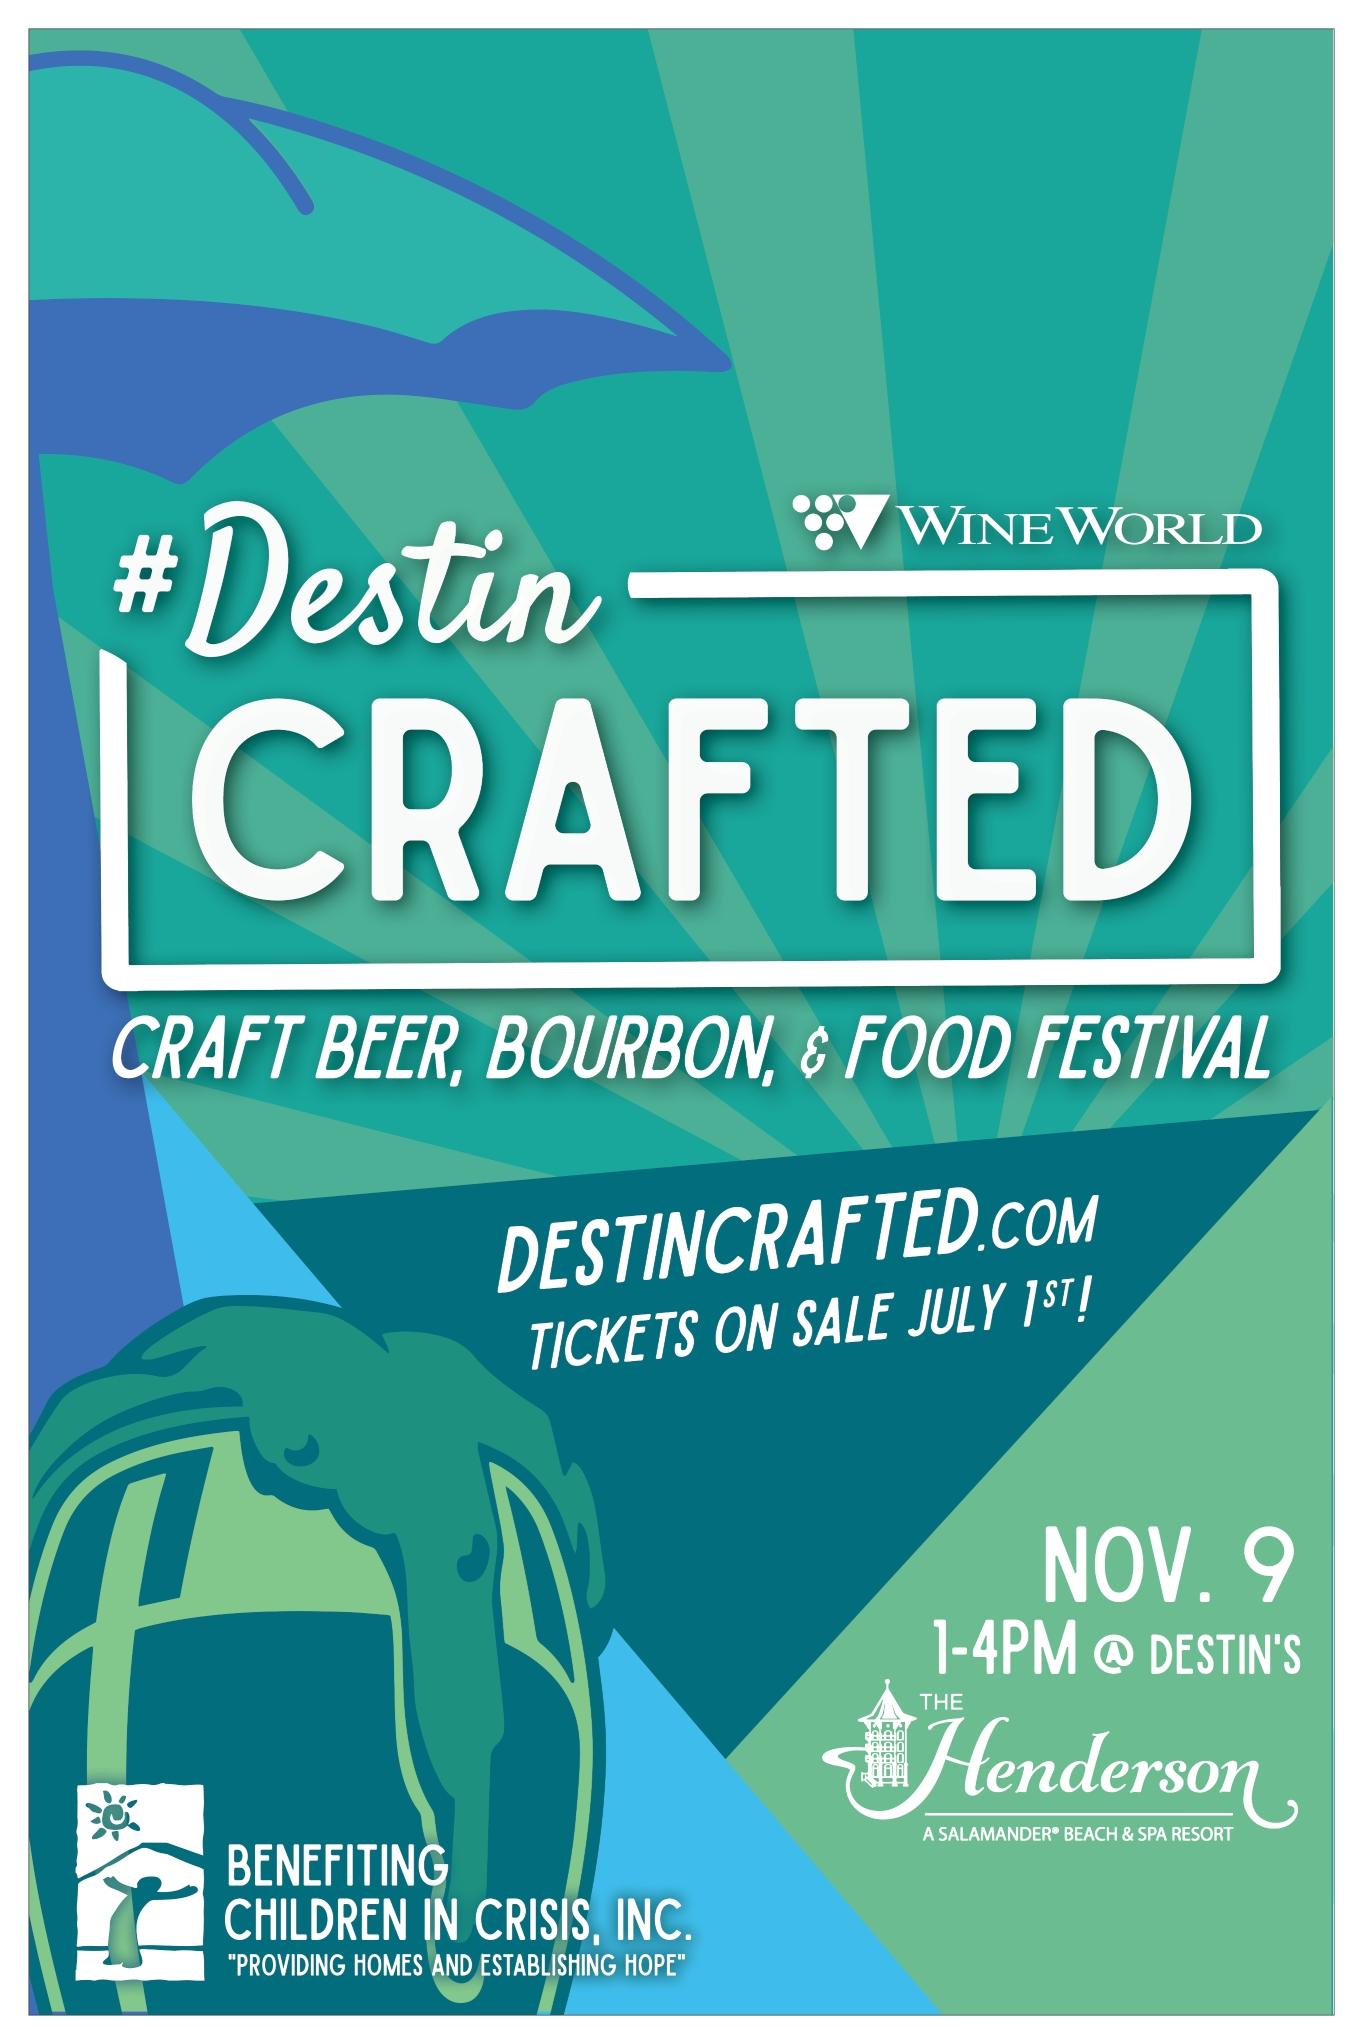 Destin Crafted bourbon & beer festival